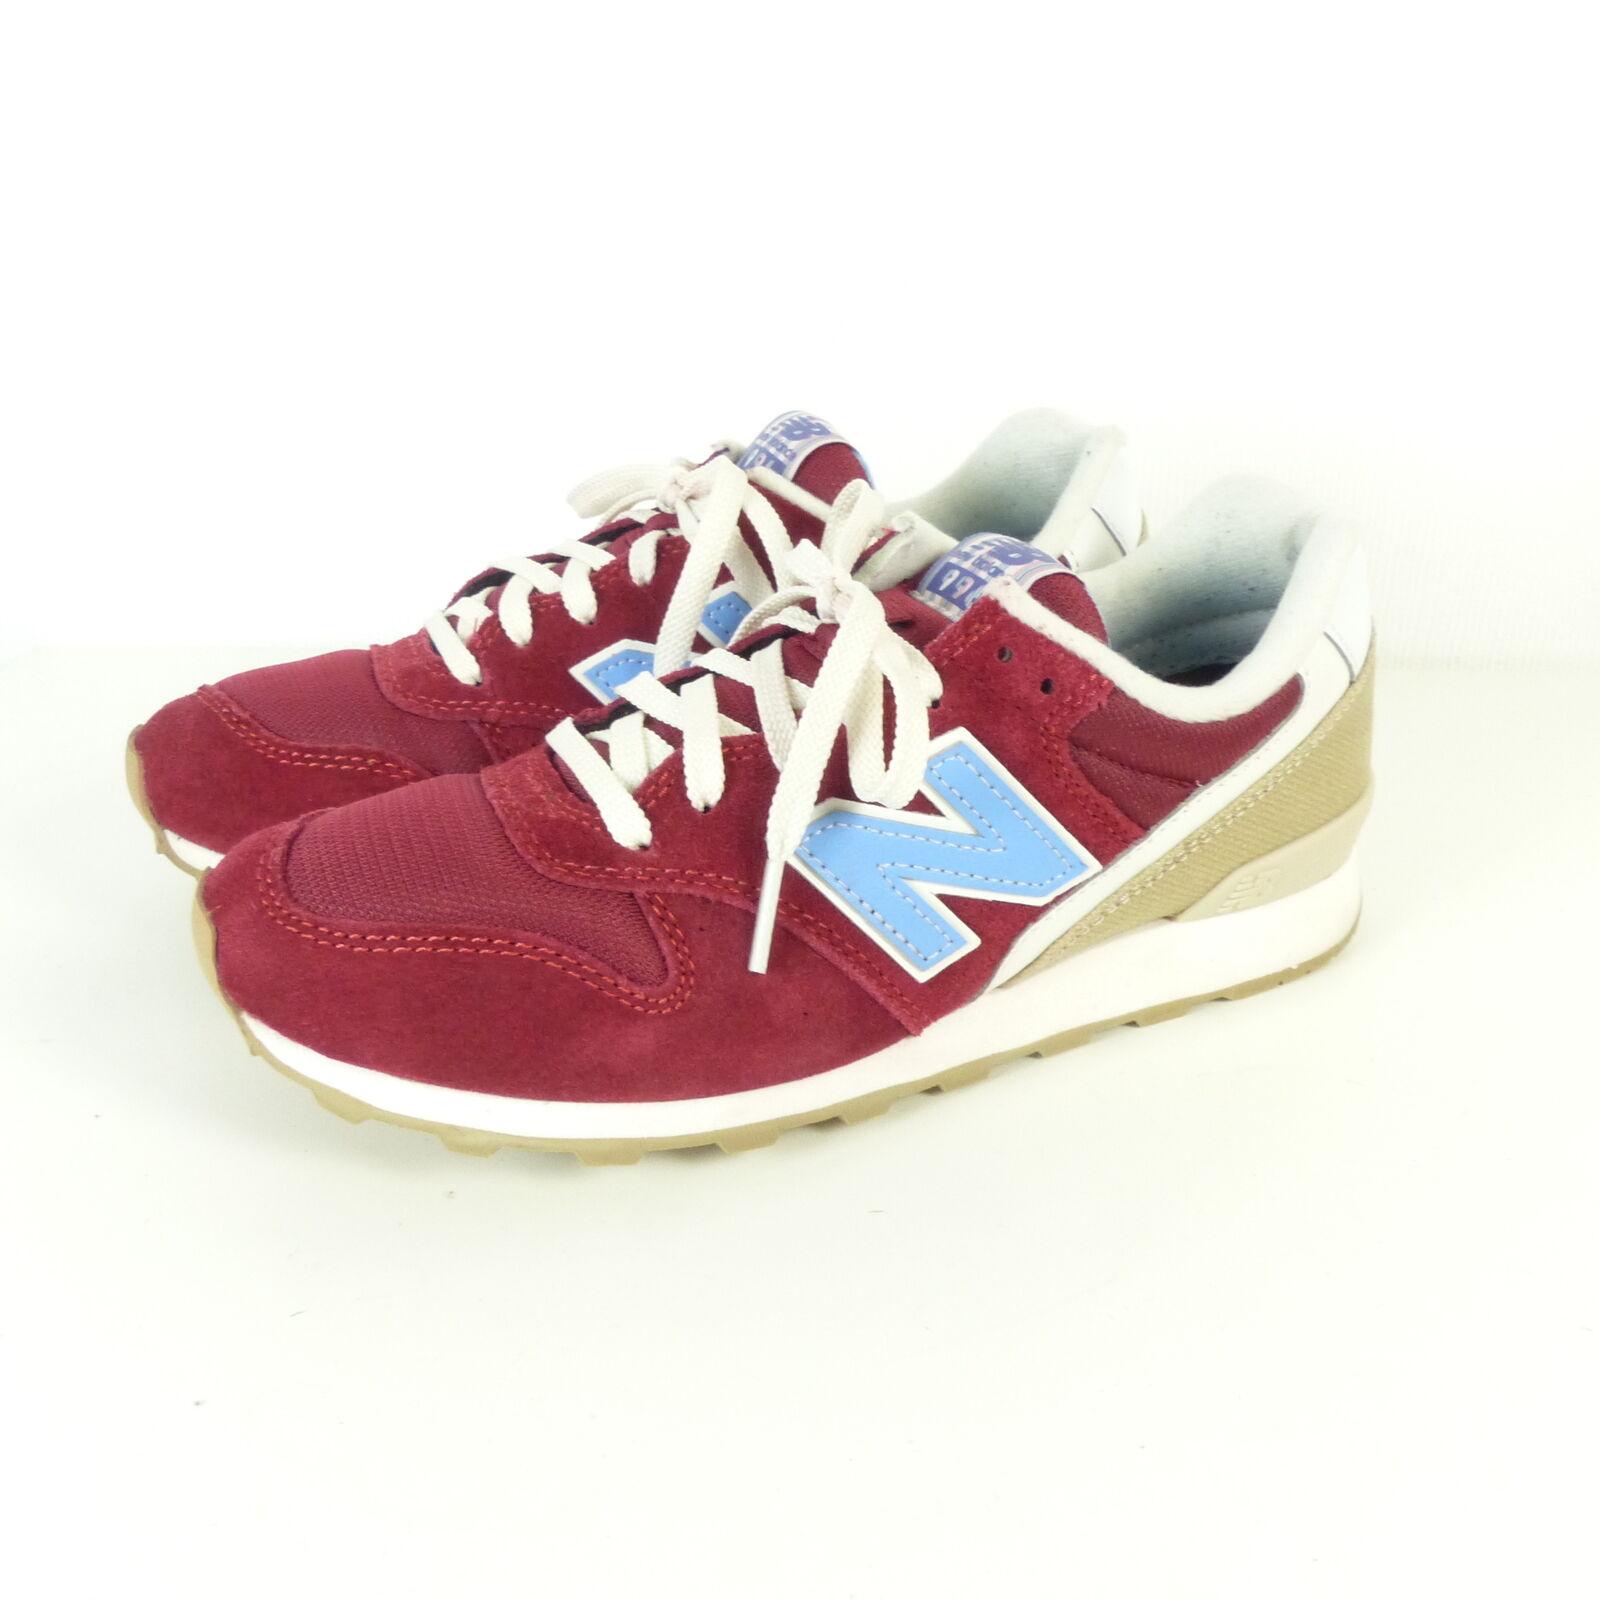 NEW BALANCE Sneaker Turnschuhe WR996HF  Turnschuhe Sneaker Rot Burgund Gr. EUR 37,5   7 (SR9) 3c2d3e